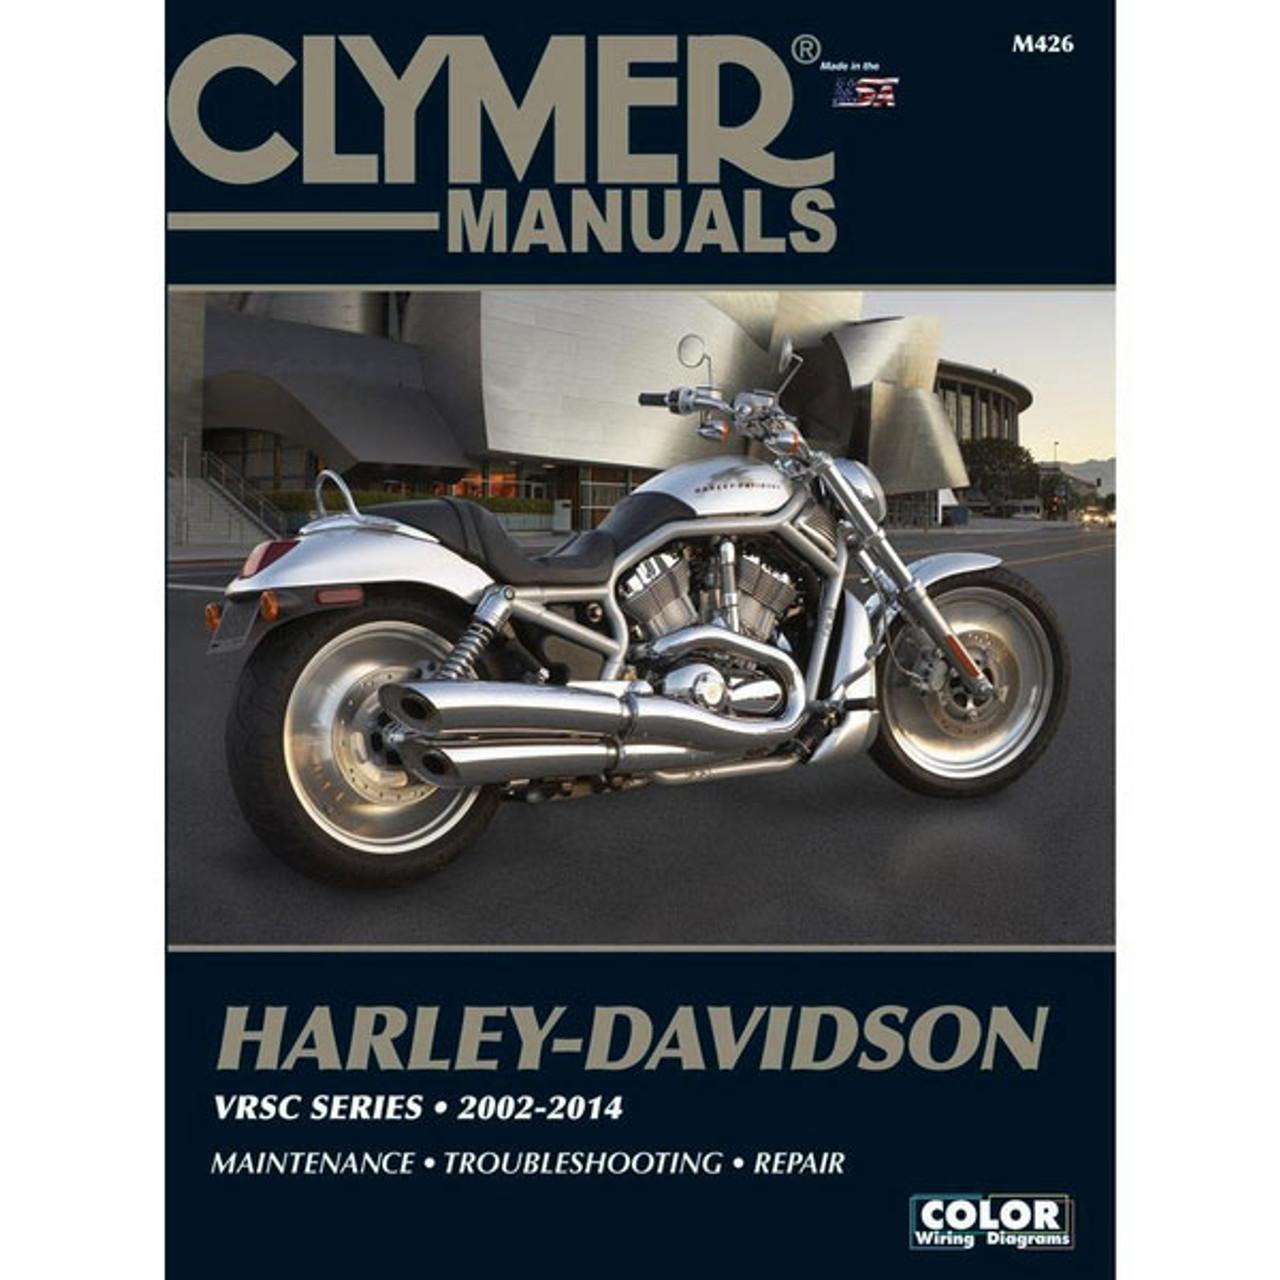 harley davidson wheel diagram clymer harley davidson vrsc series 02 14 service manual  clymer harley davidson vrsc series 02